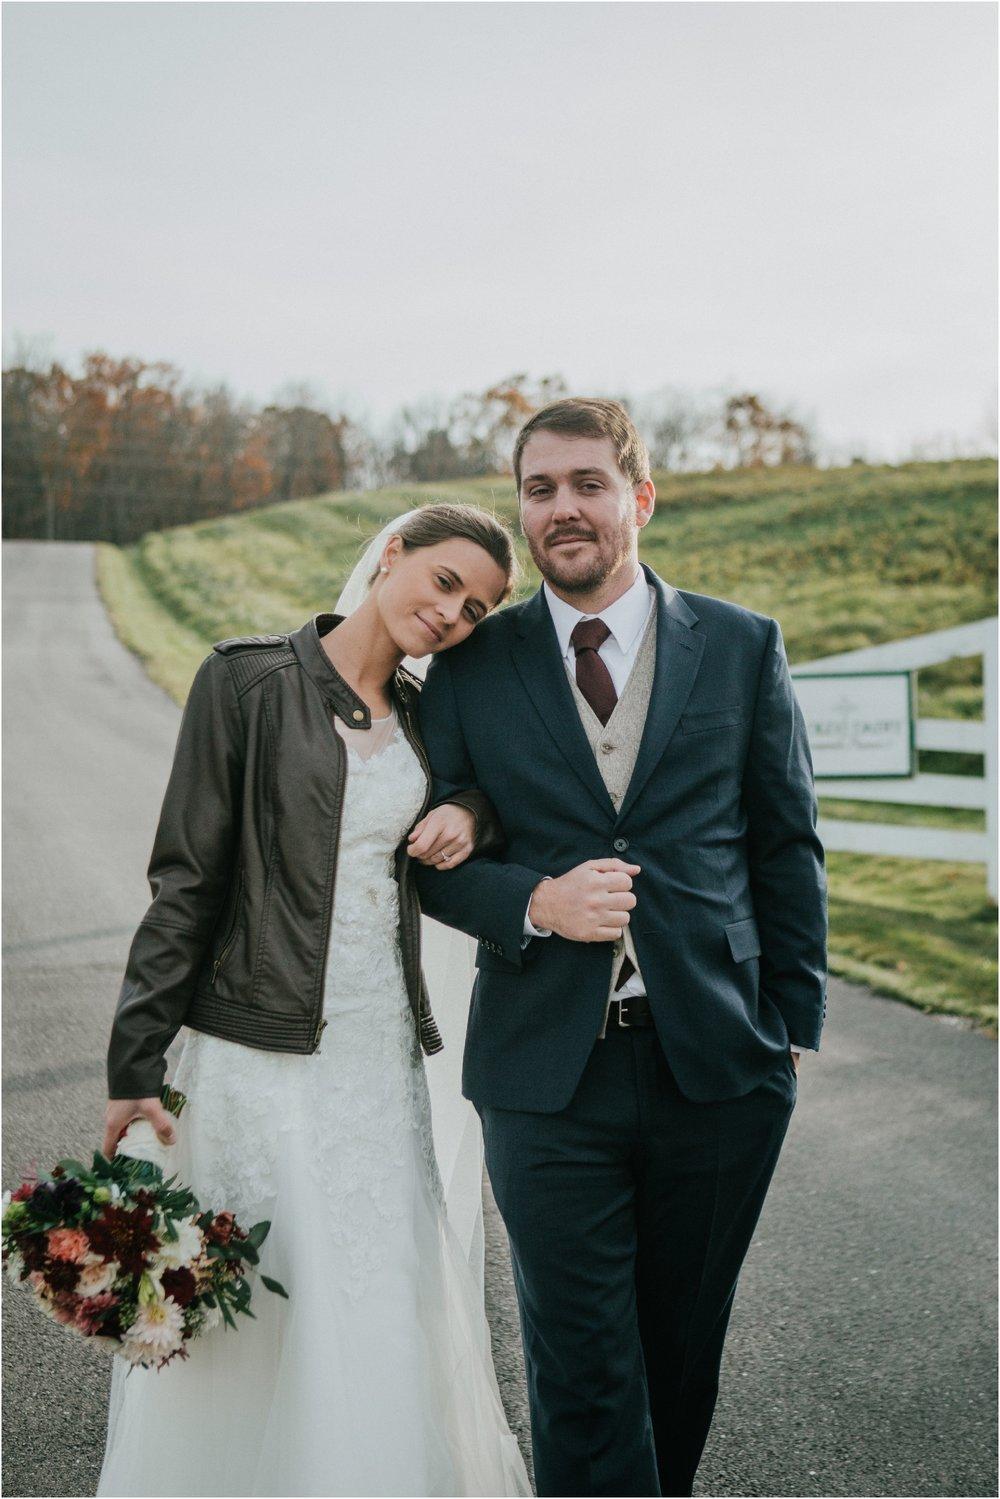 warm-springs-old-dairy-virginia-rustic-wedding-northeast-tennessee-elopement-adventuruous-photographer-katy-sergent_0043.jpg